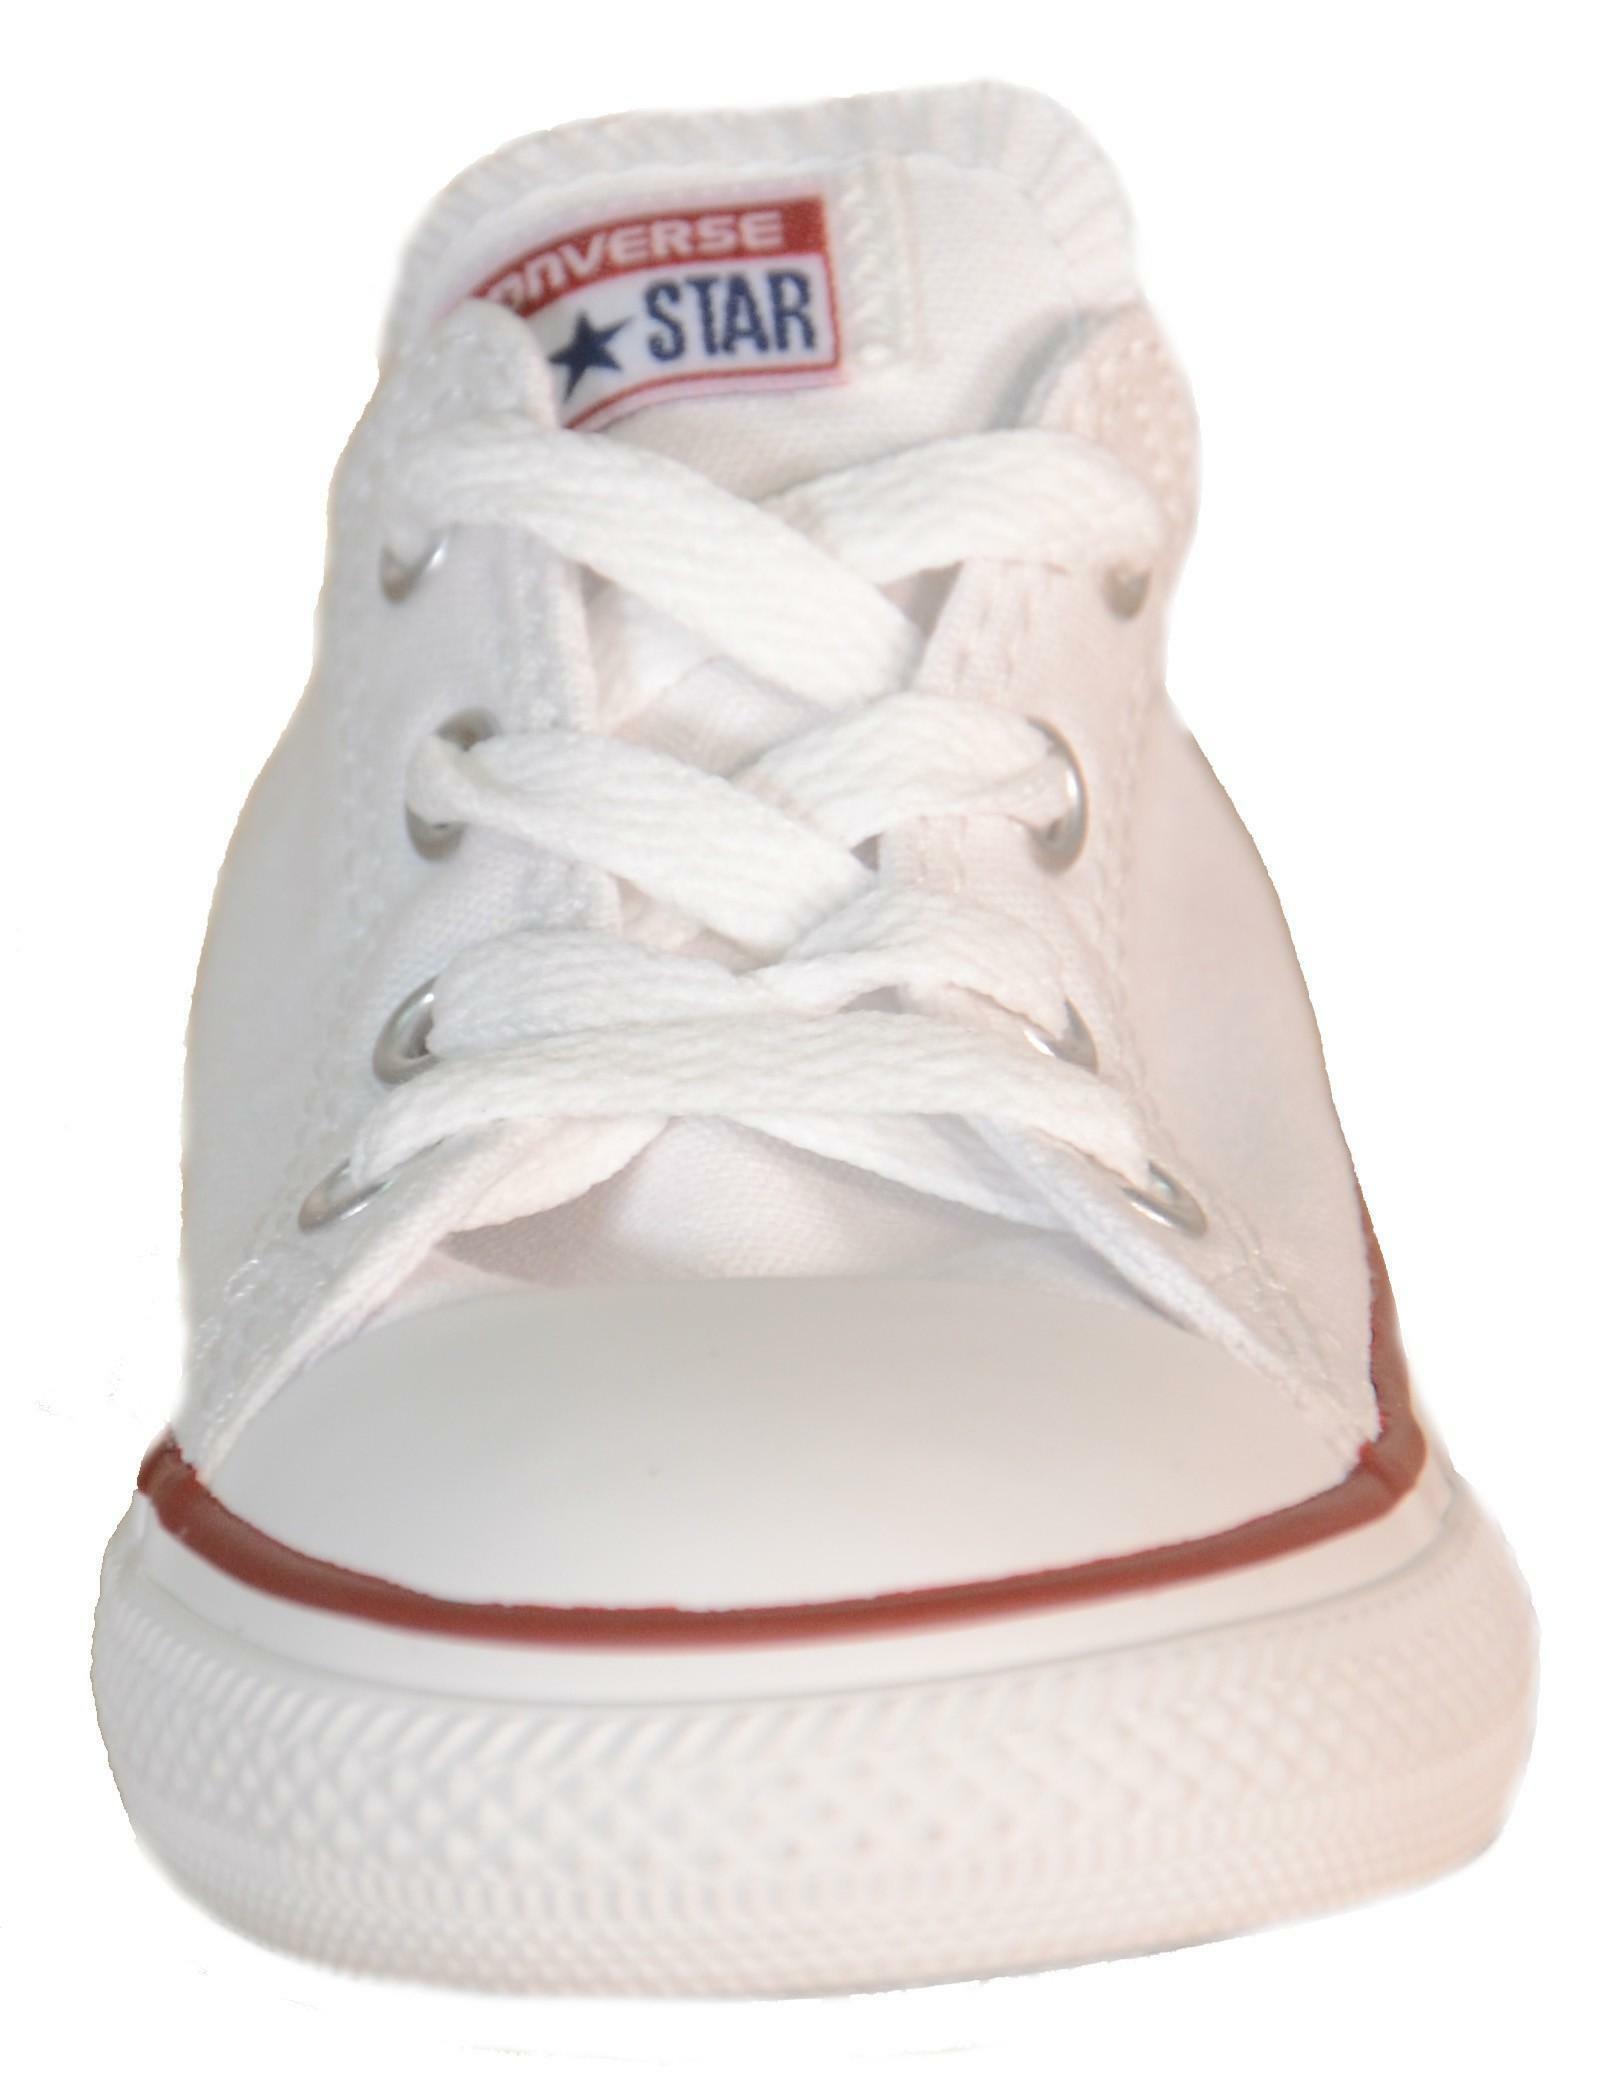 converse converse all star ox optical white scarpe bambino bianche tela 7j256c